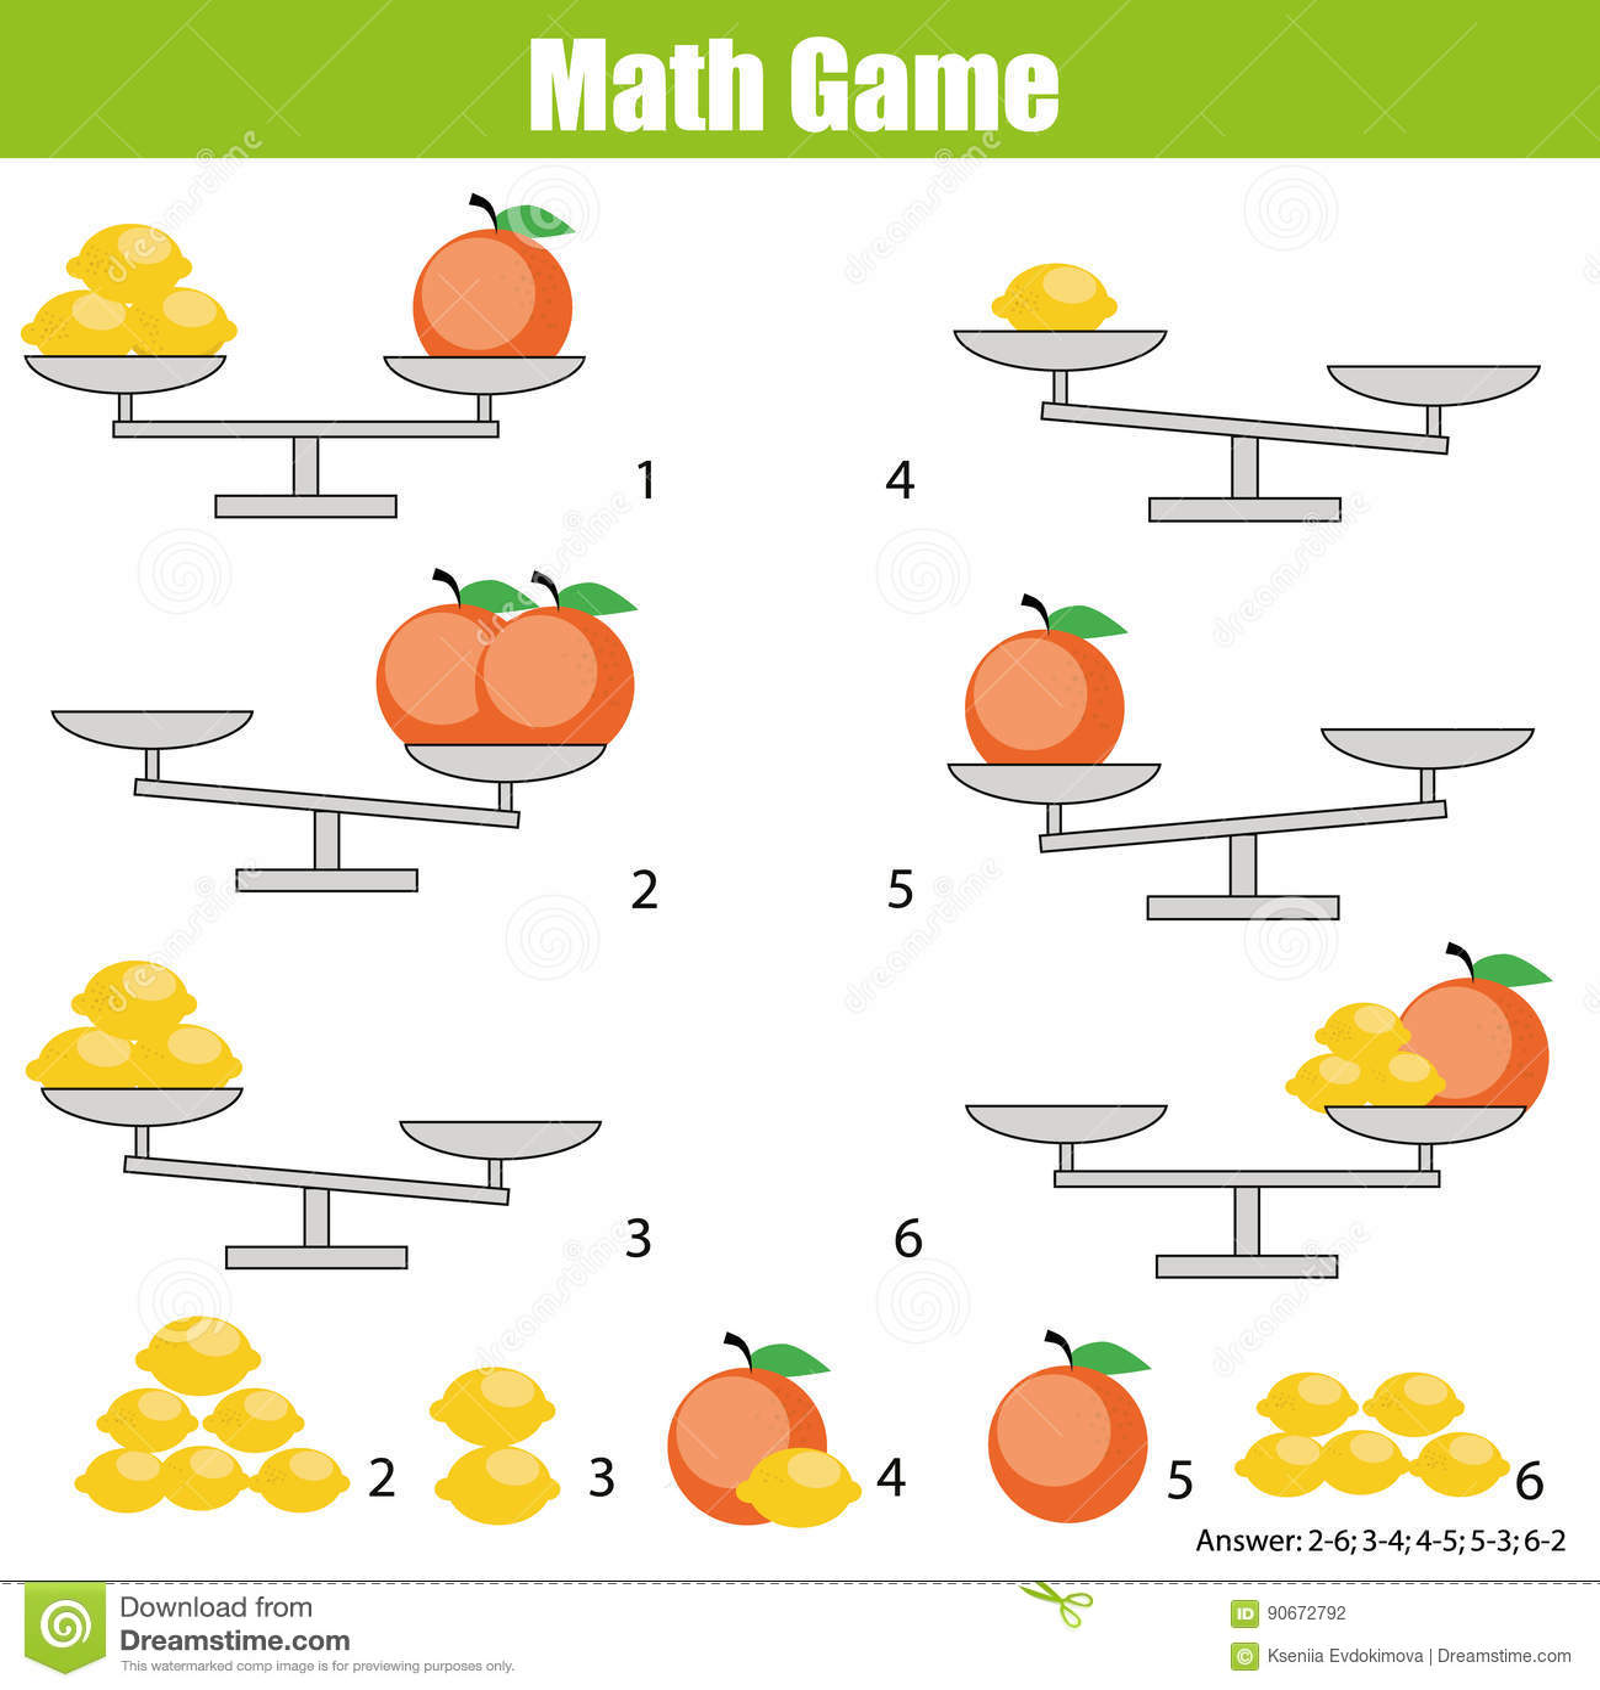 Mathematics Educational Game For Children Balance The